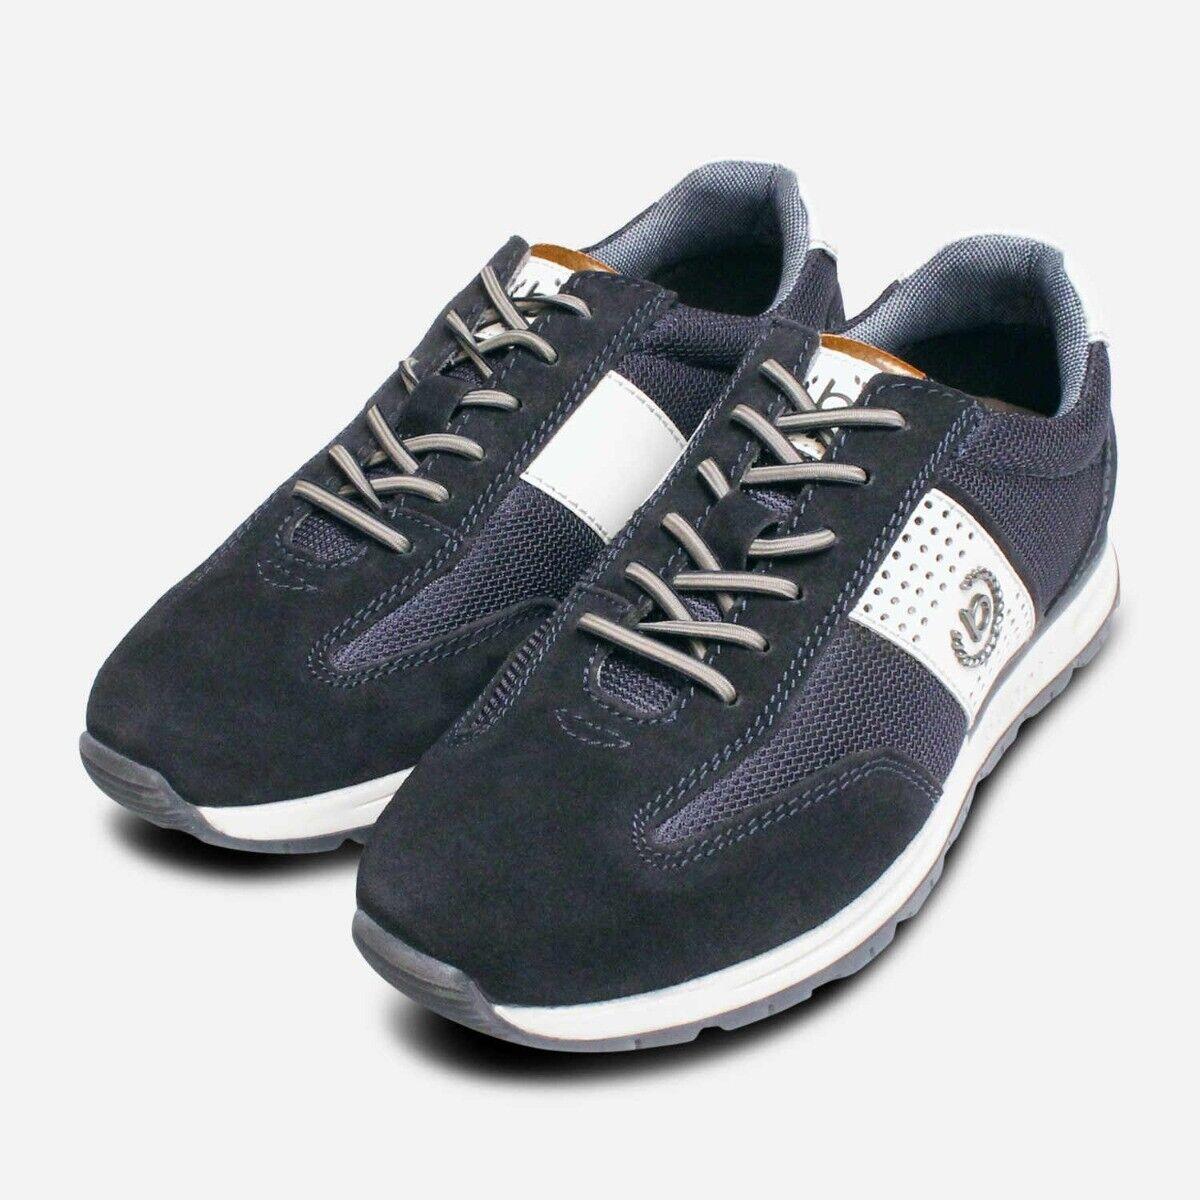 Bugatti Navy Blue Suede Designer Mens Training Shoes